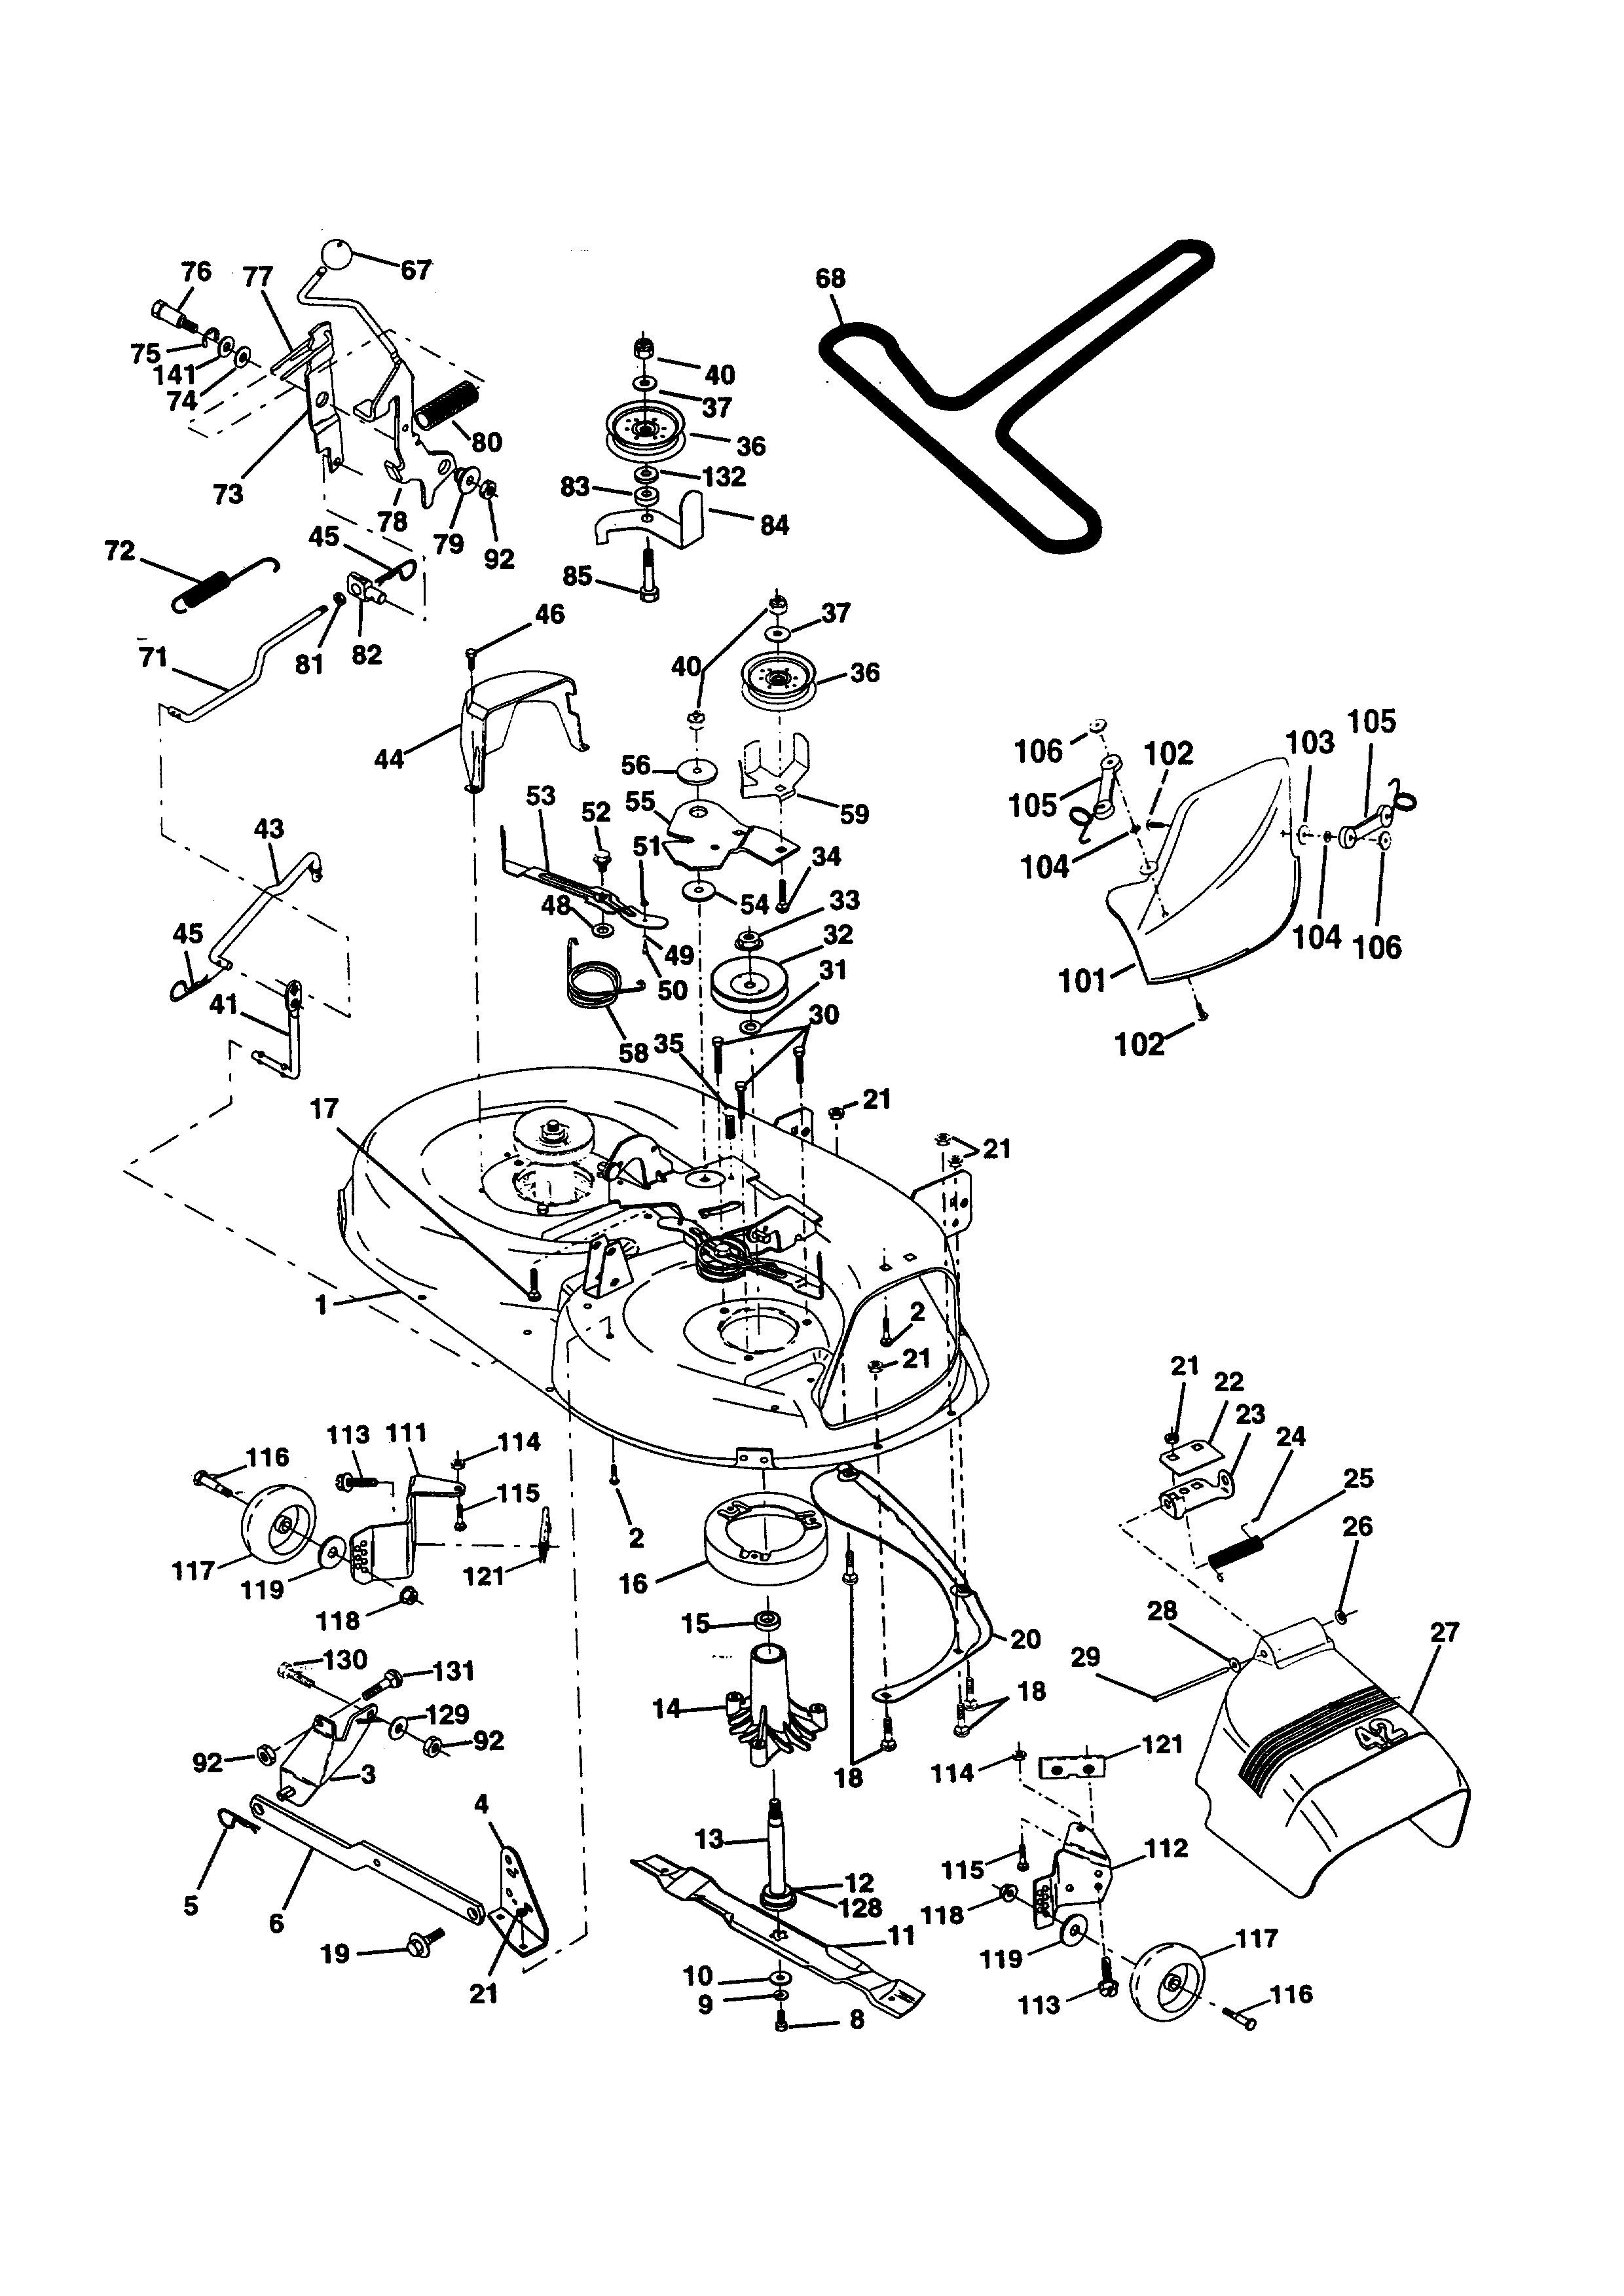 Craftsman Lawn Mower Parts Diagram Western Auto Model Ayp9187b89 Lawn Tractor Genuine Parts Of Craftsman Lawn Mower Parts Diagram